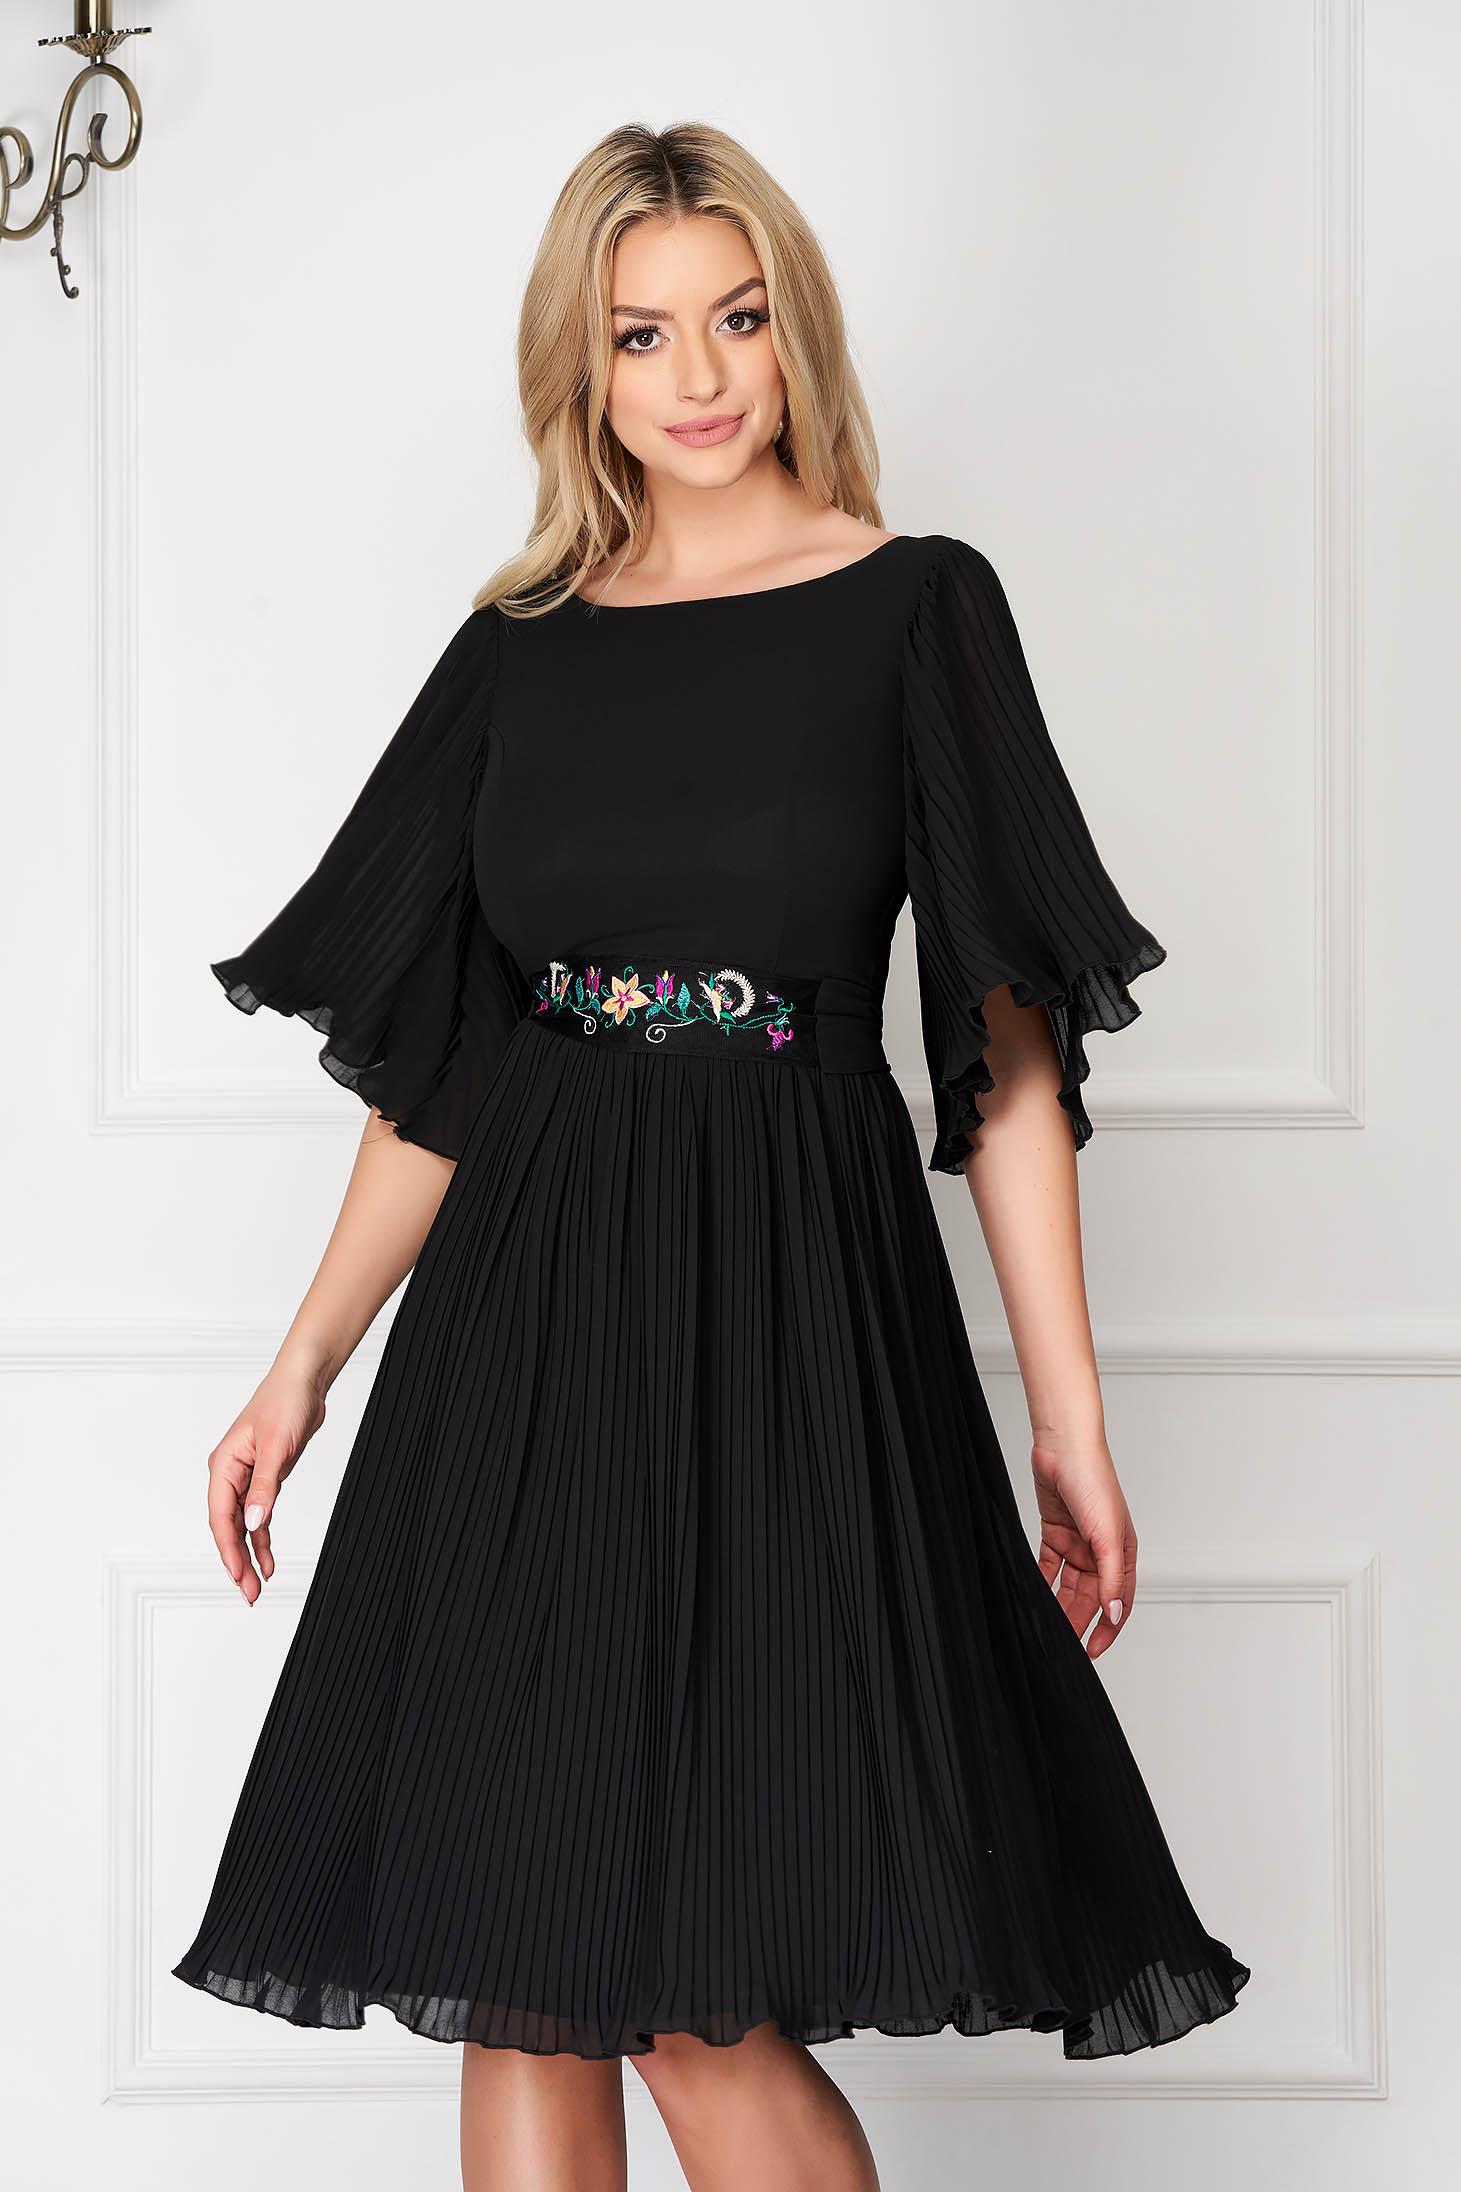 Rochie StarShinerS neagra eleganta midi din voal plisat cu cordon brodat in atelierele StarShinerS